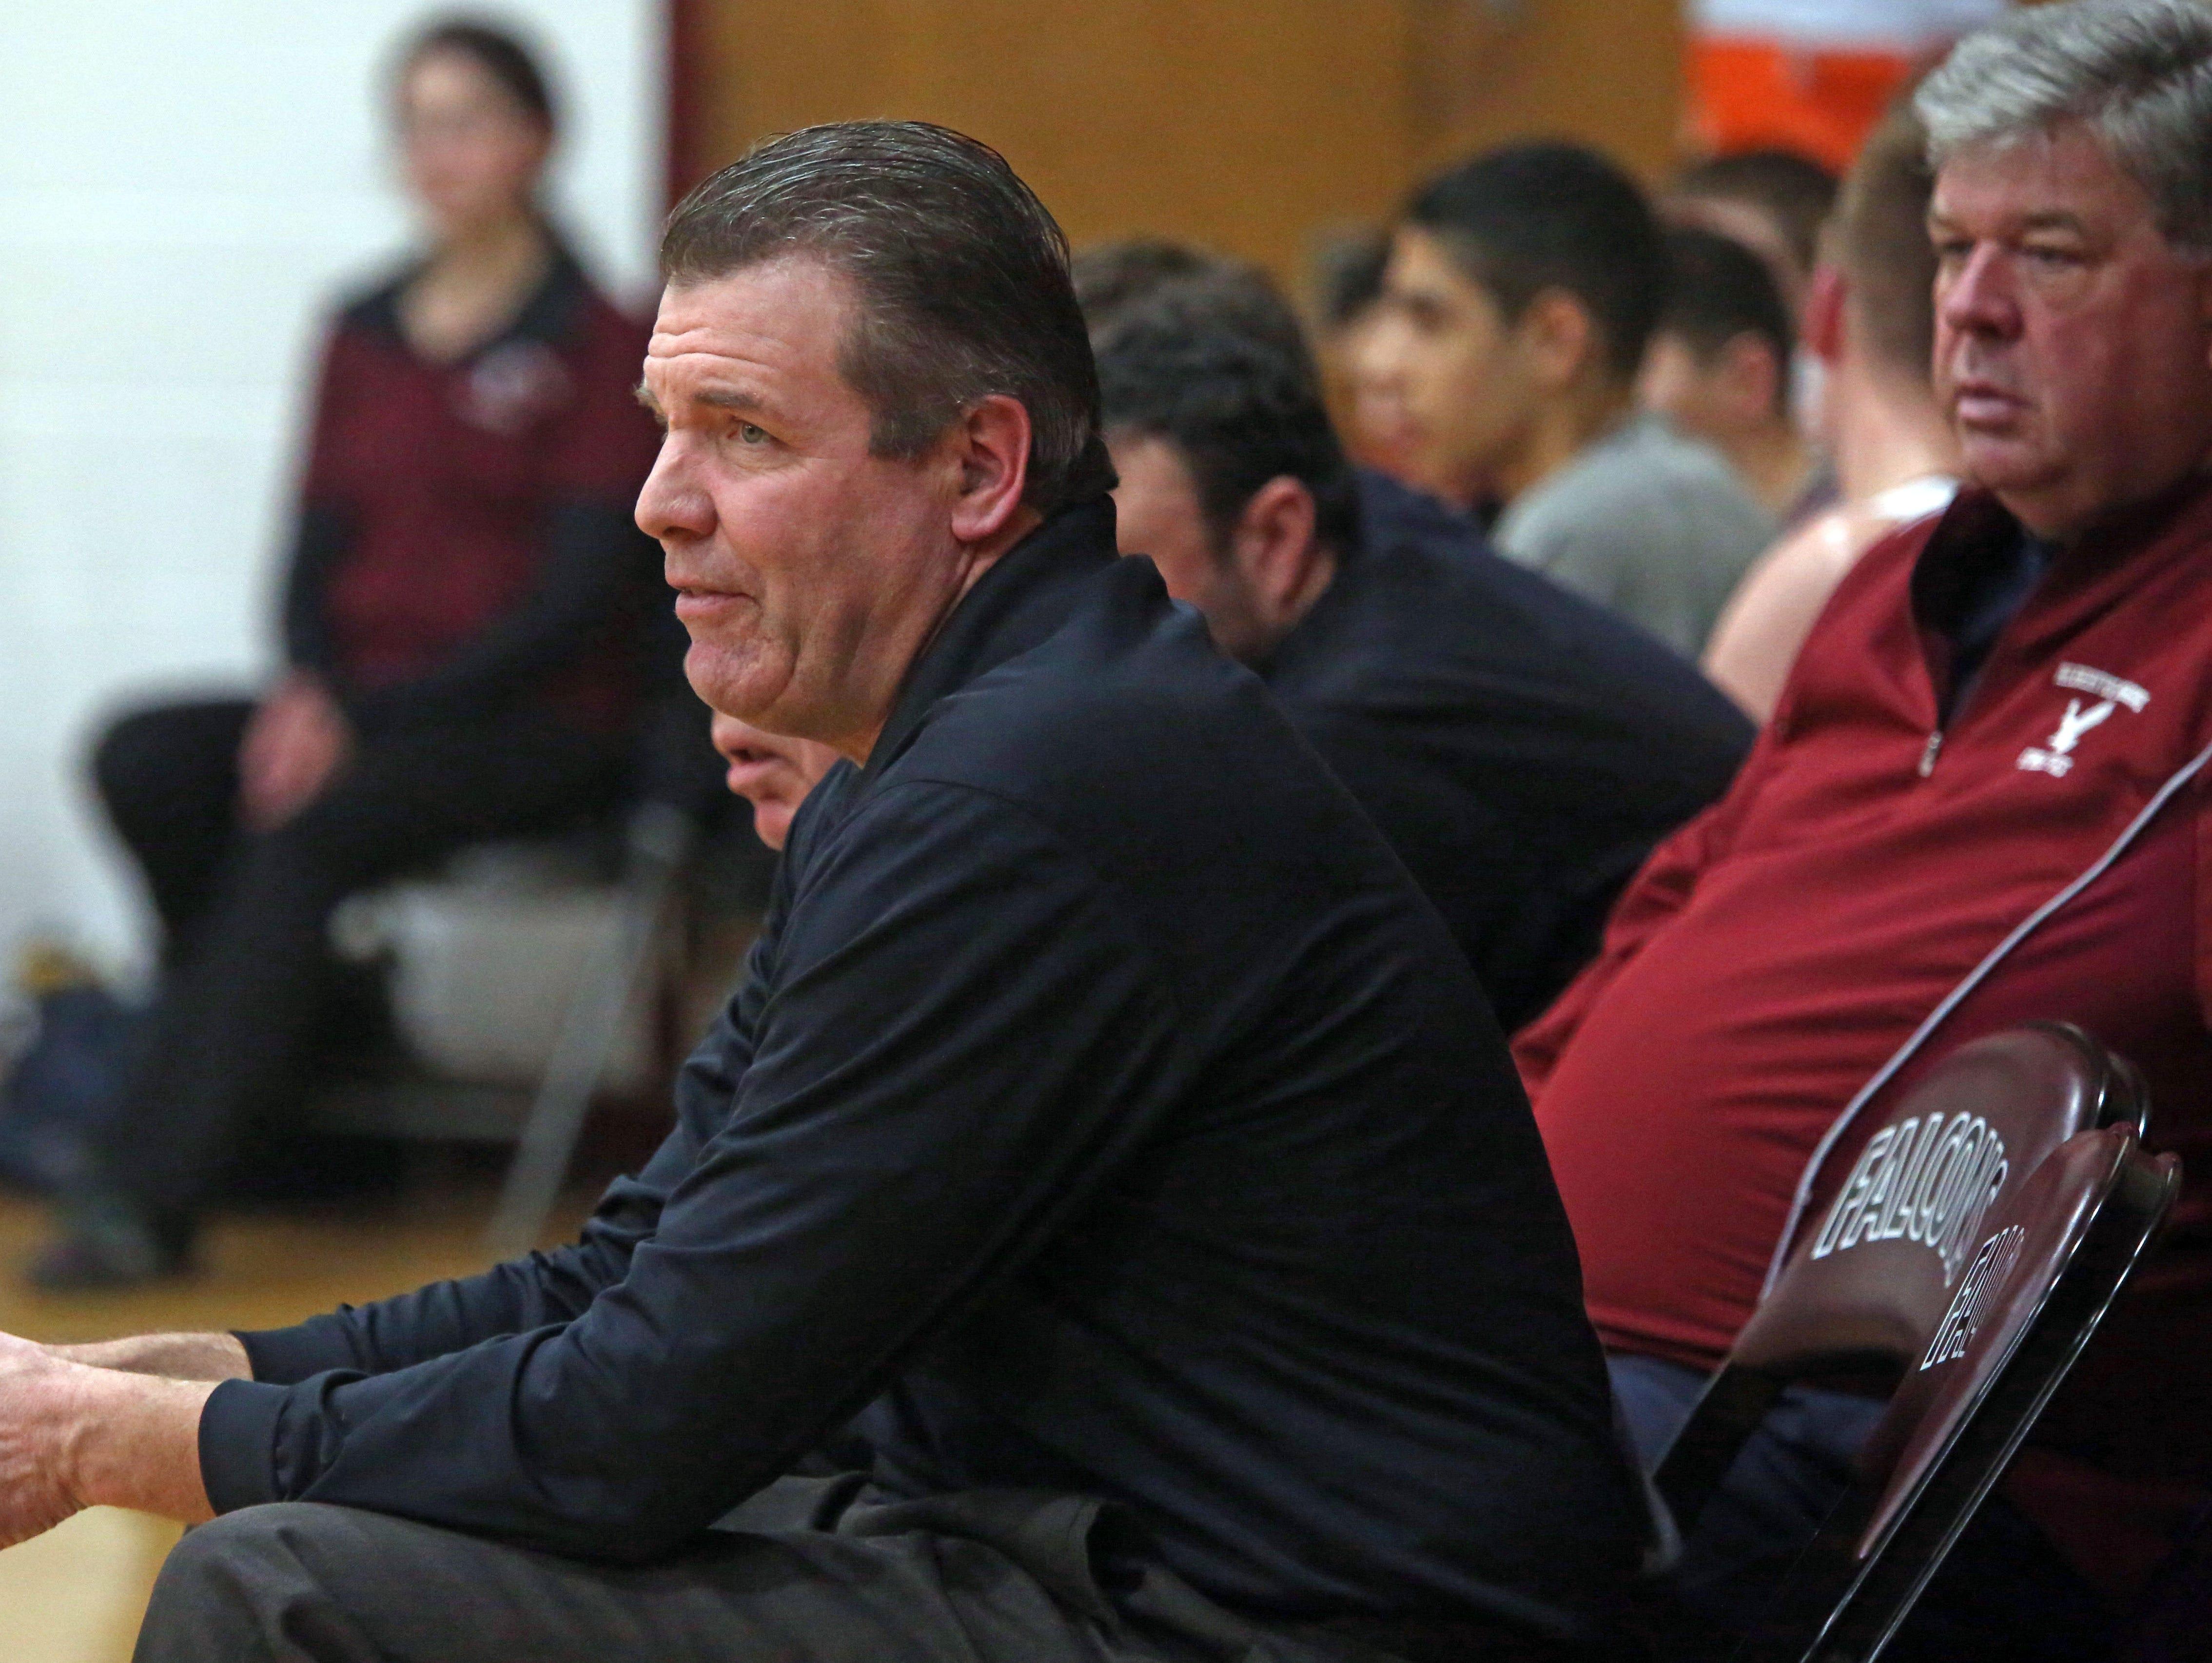 Albertus Magus head coach Patrick McFadden watches his team play Riverside during boys basketball game at Albertus Magnus High School Feb. 12, 2016.